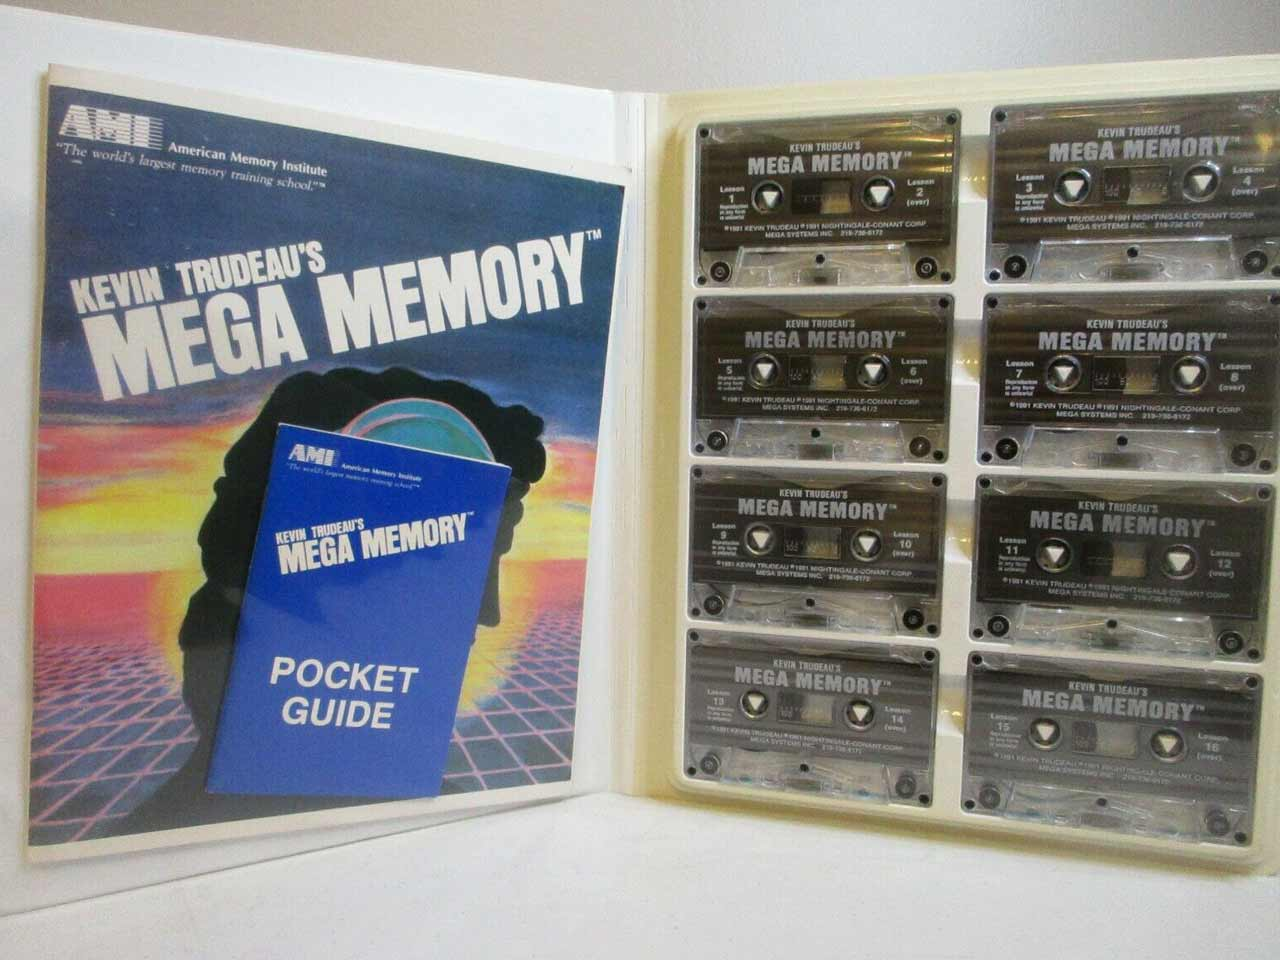 Cassette tapes of Kevin Trudeau's Mega Memory audio program.